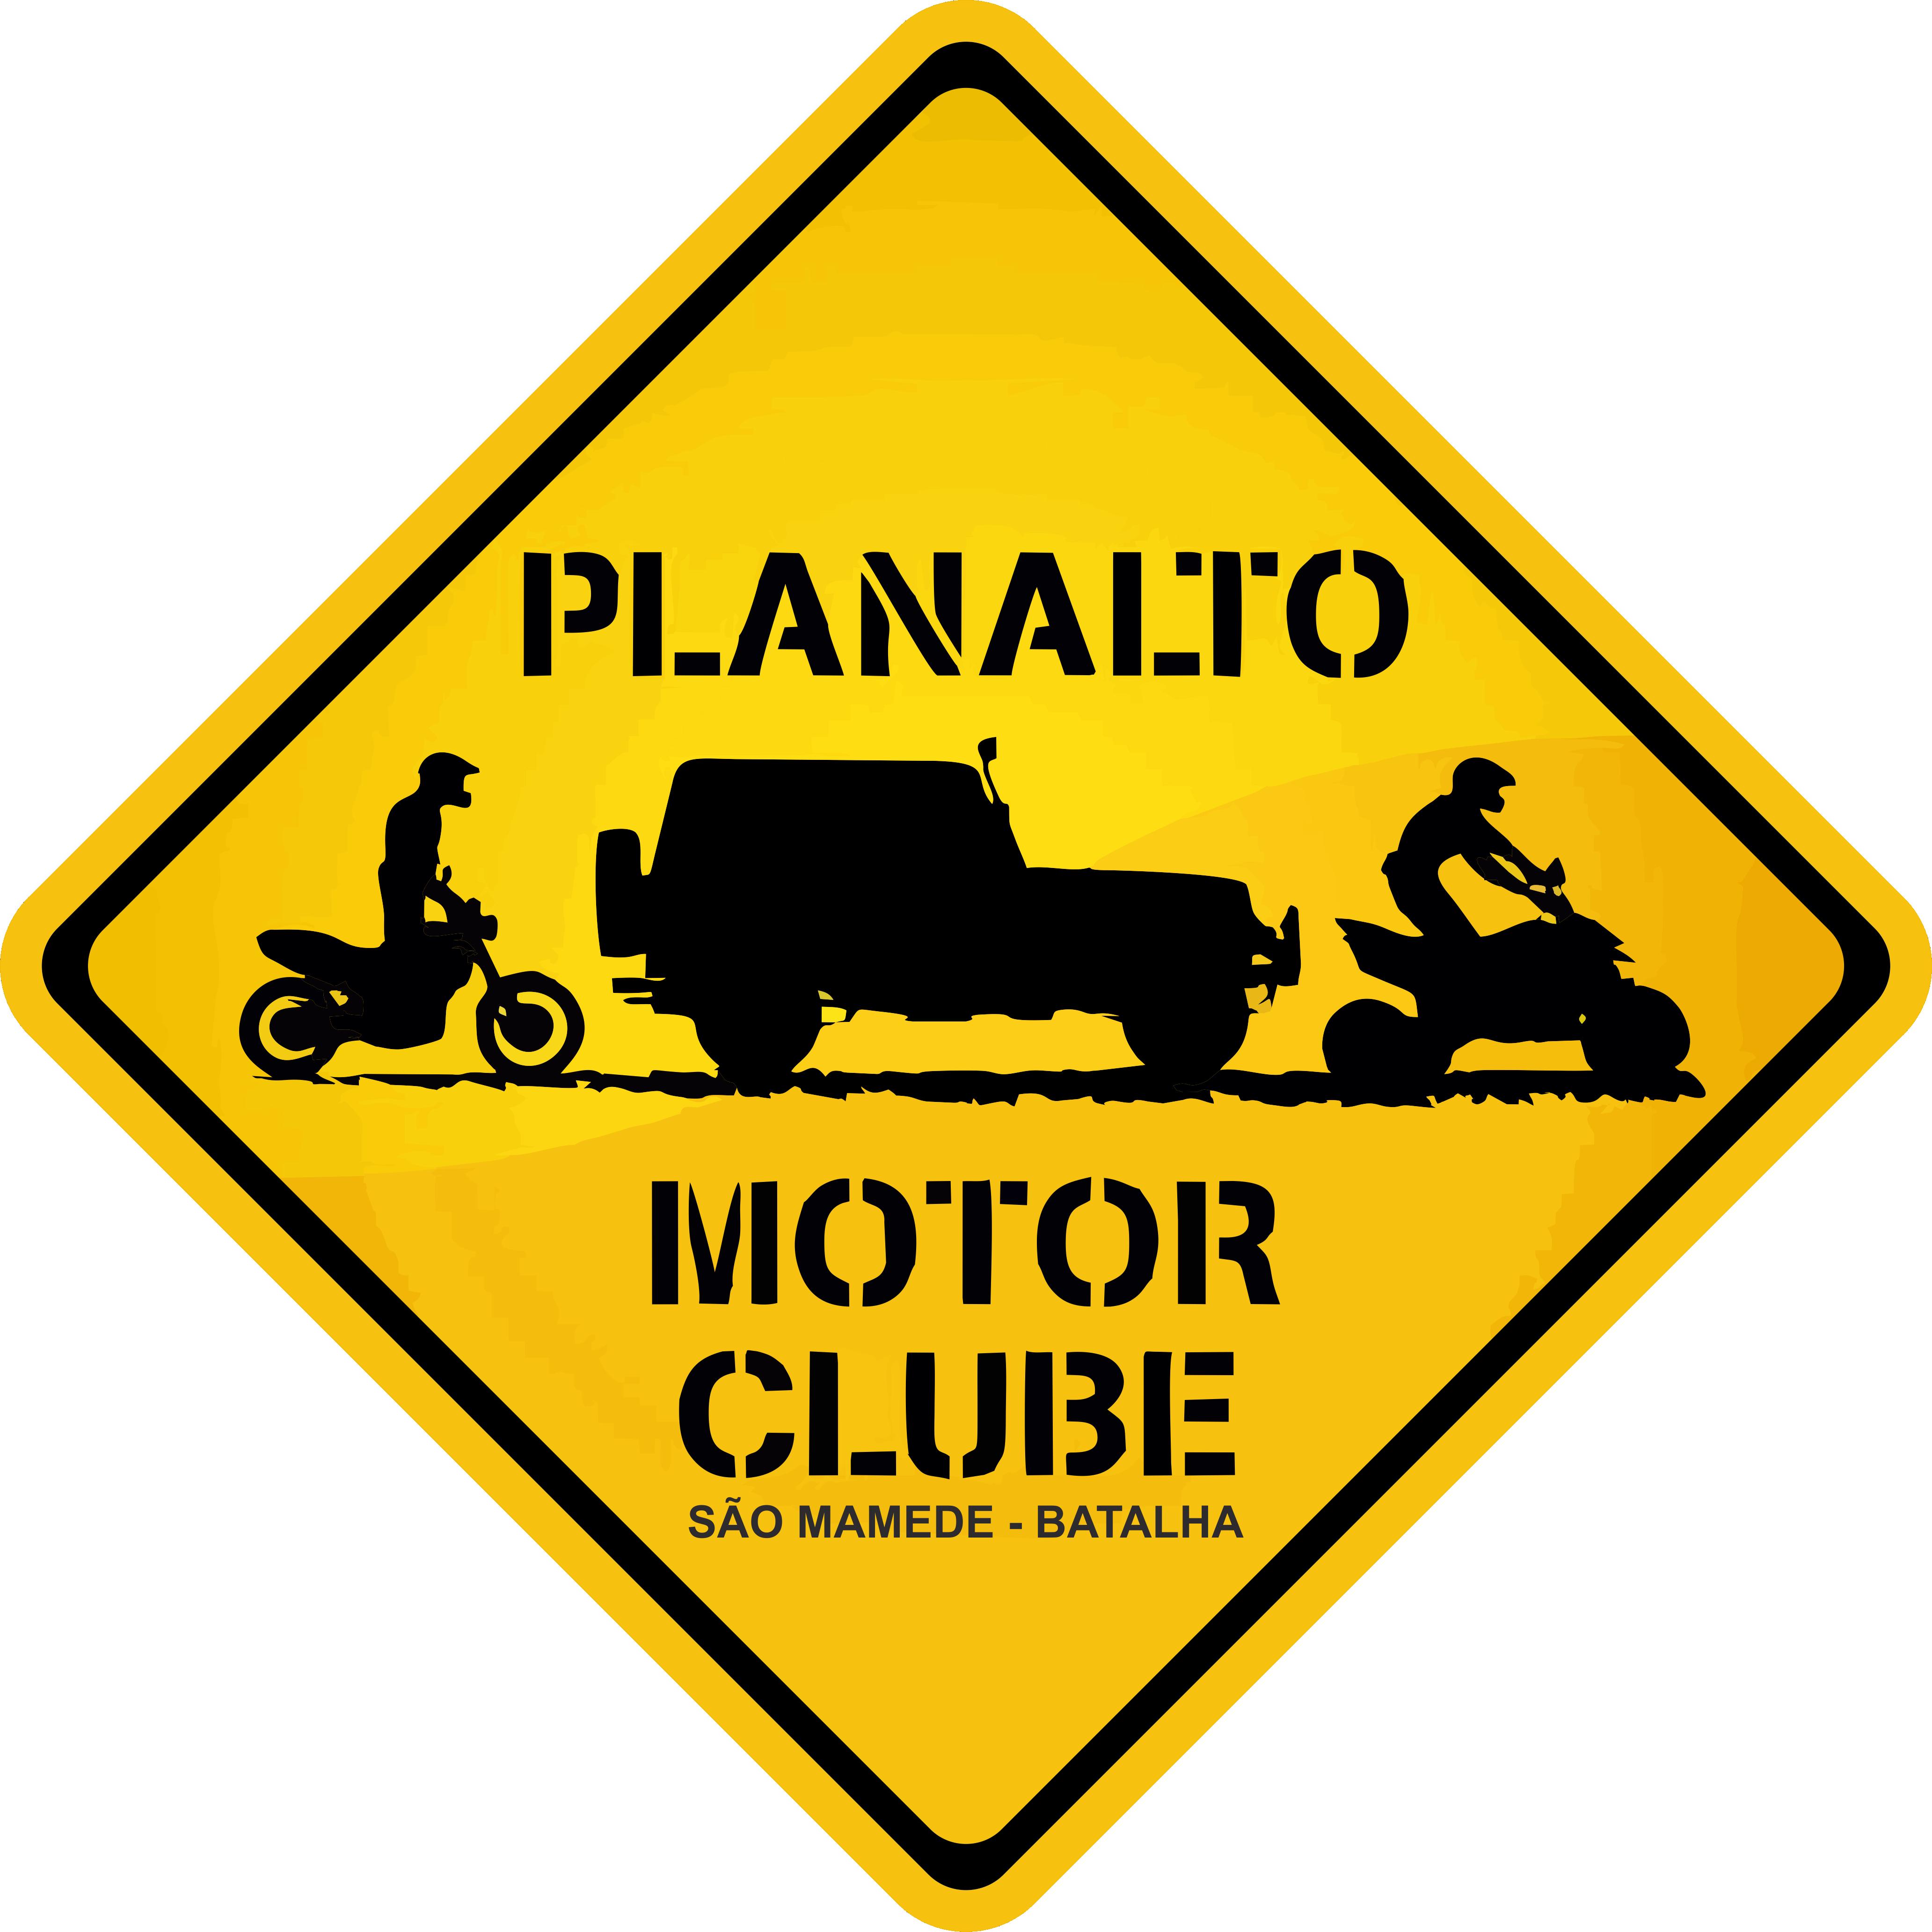 Planalto Motor Clube